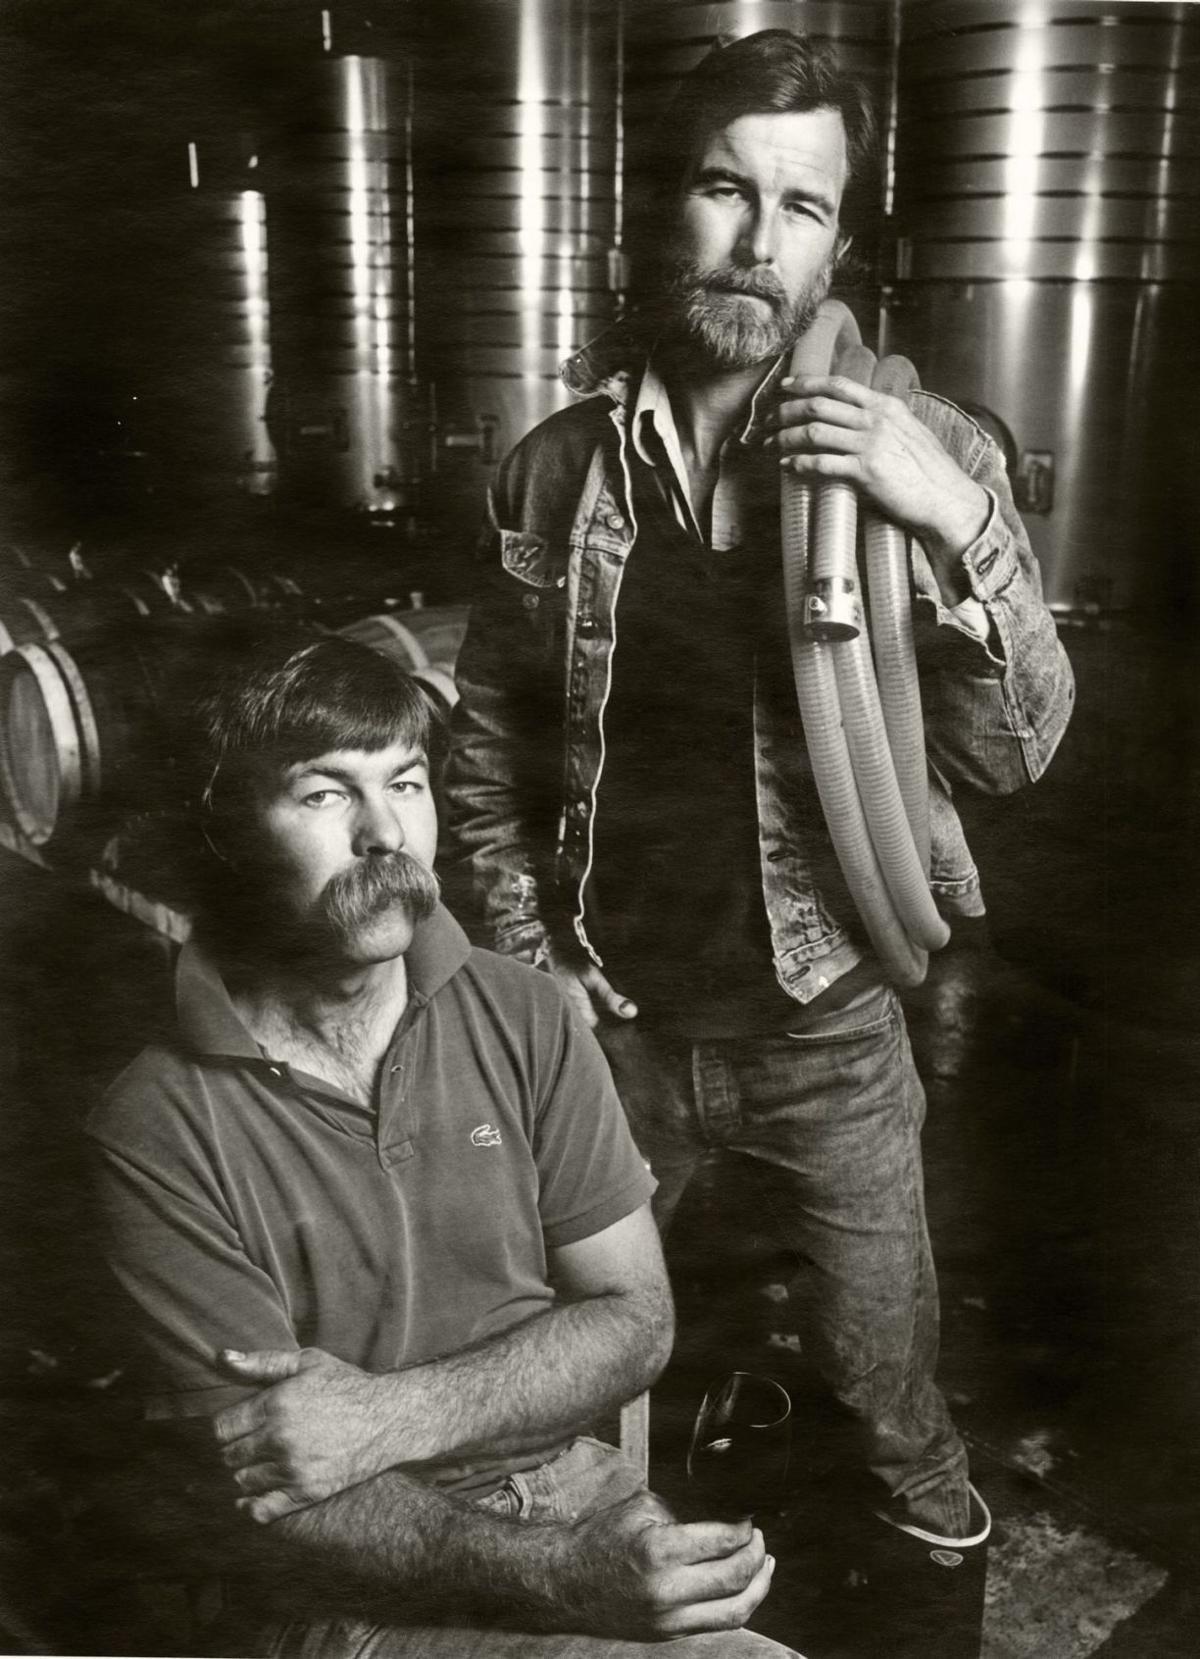 Stu and Charles Smith